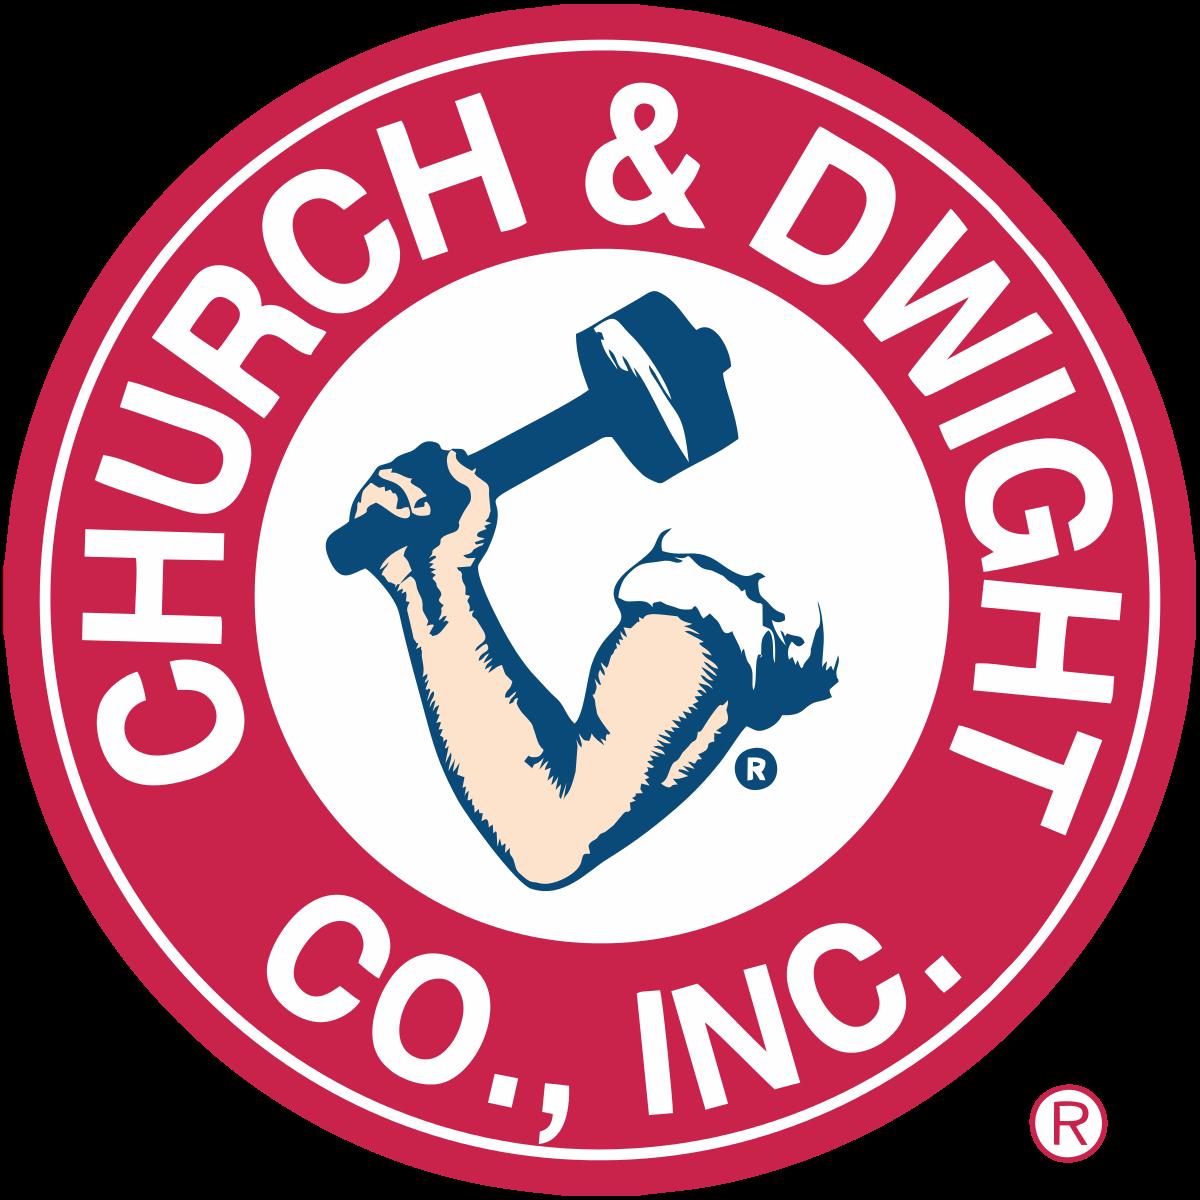 church & dwight.jpg